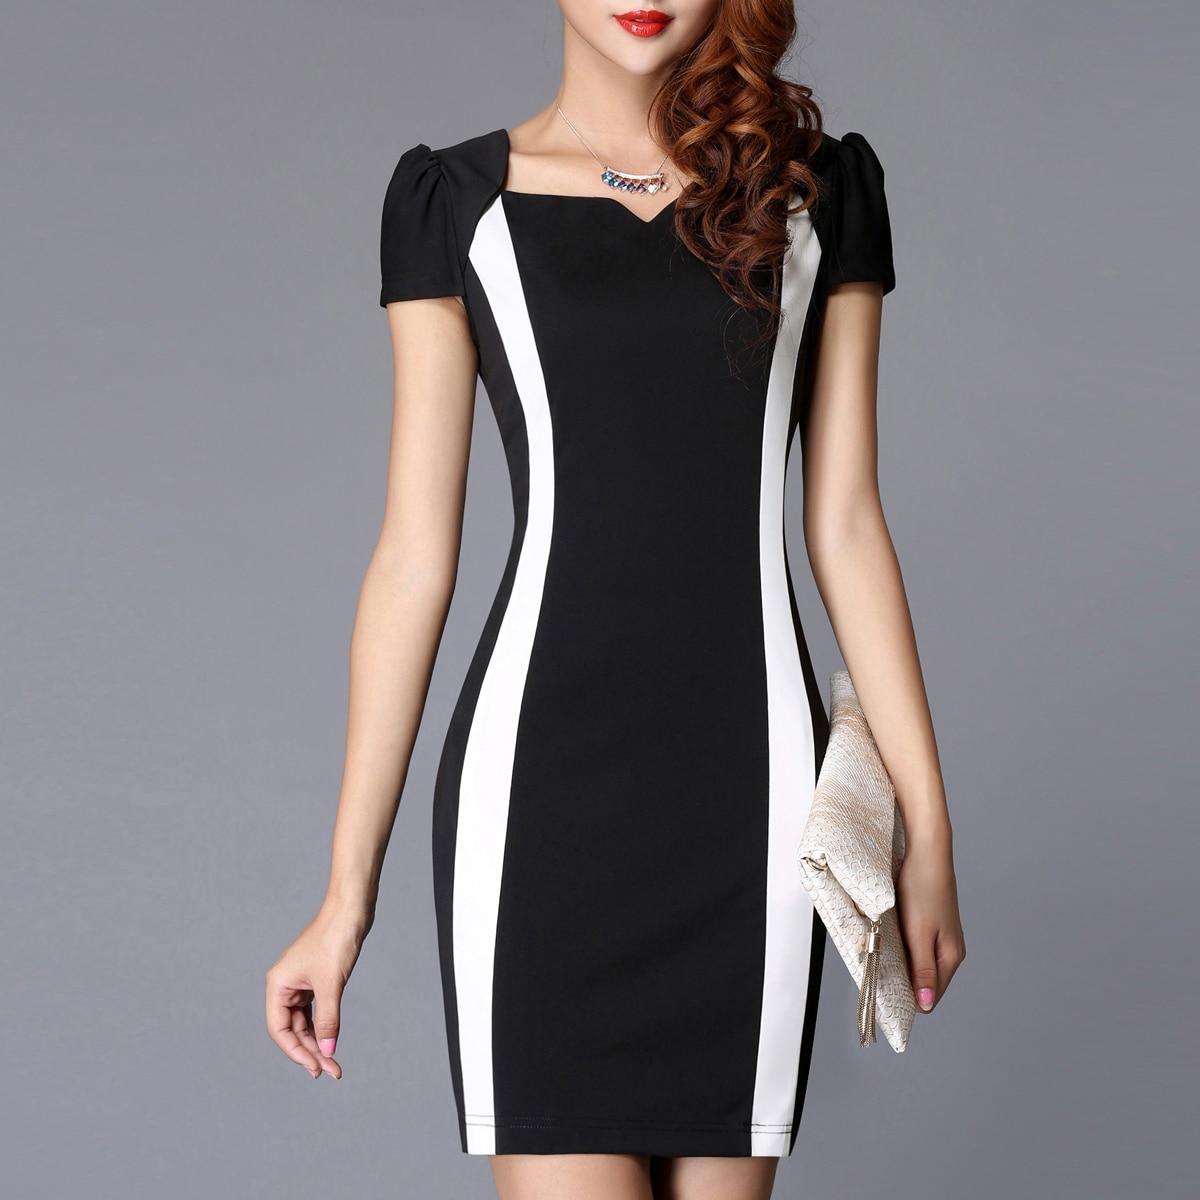 Fashion fashion summer one-piece dress new arrival bubble short-sleeve patchwork color block slim one-piece dress 8272